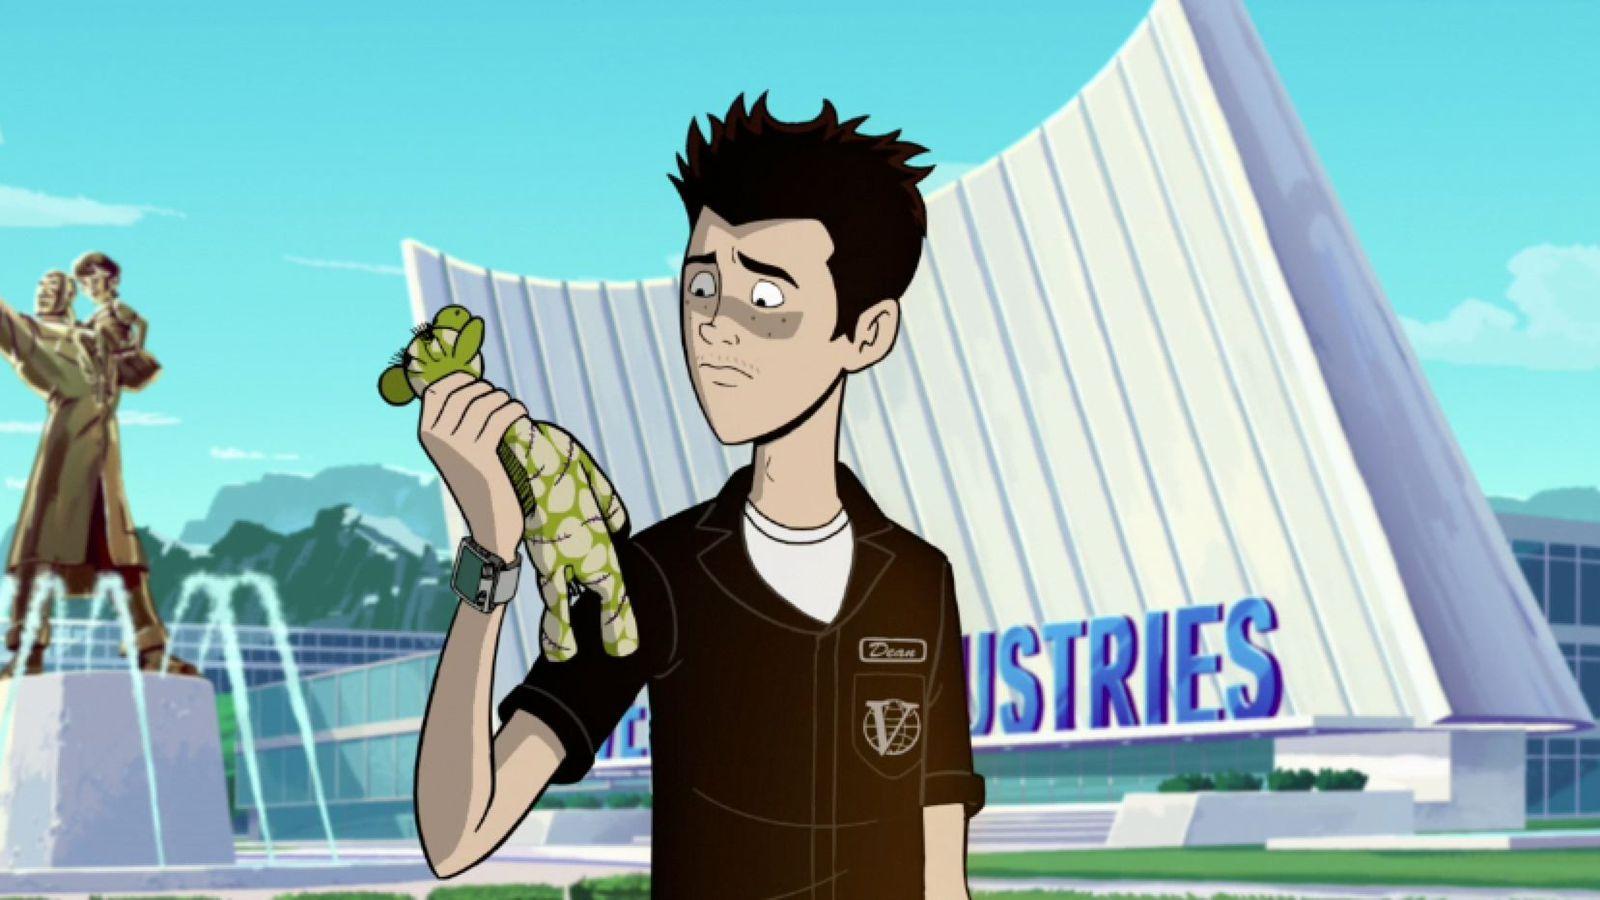 Venture bros season 6 release date in Australia